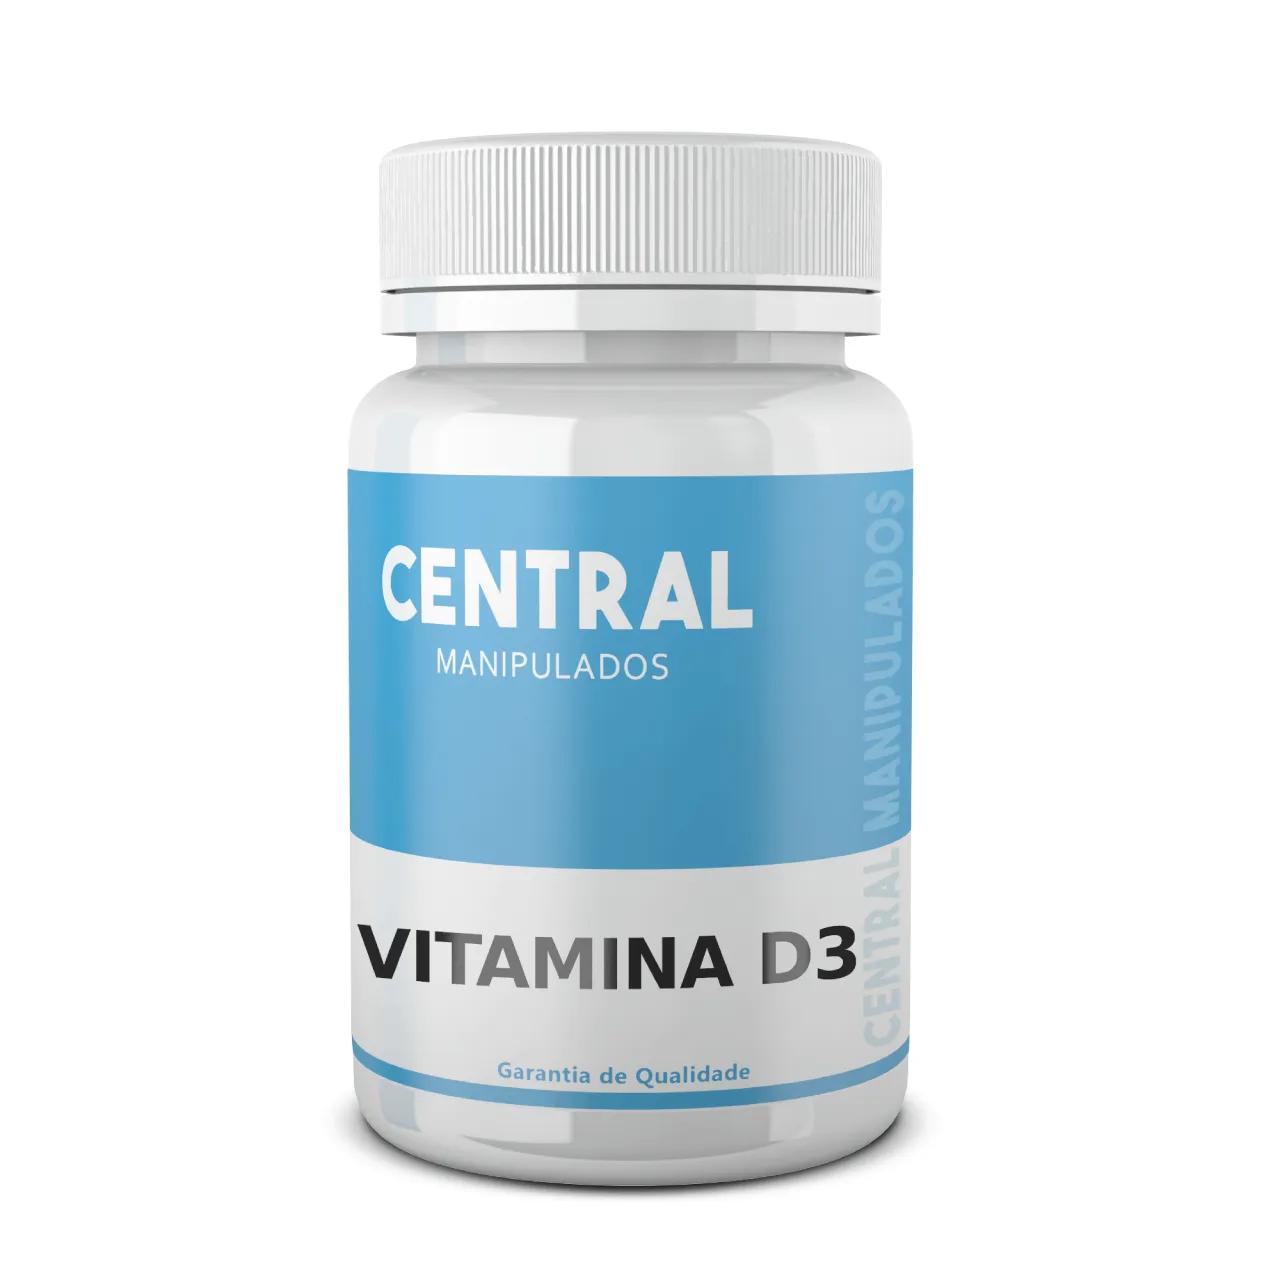 Vitamina D3 5.000 UI - 30 cápsulas - Saúde Óssea e Muscular